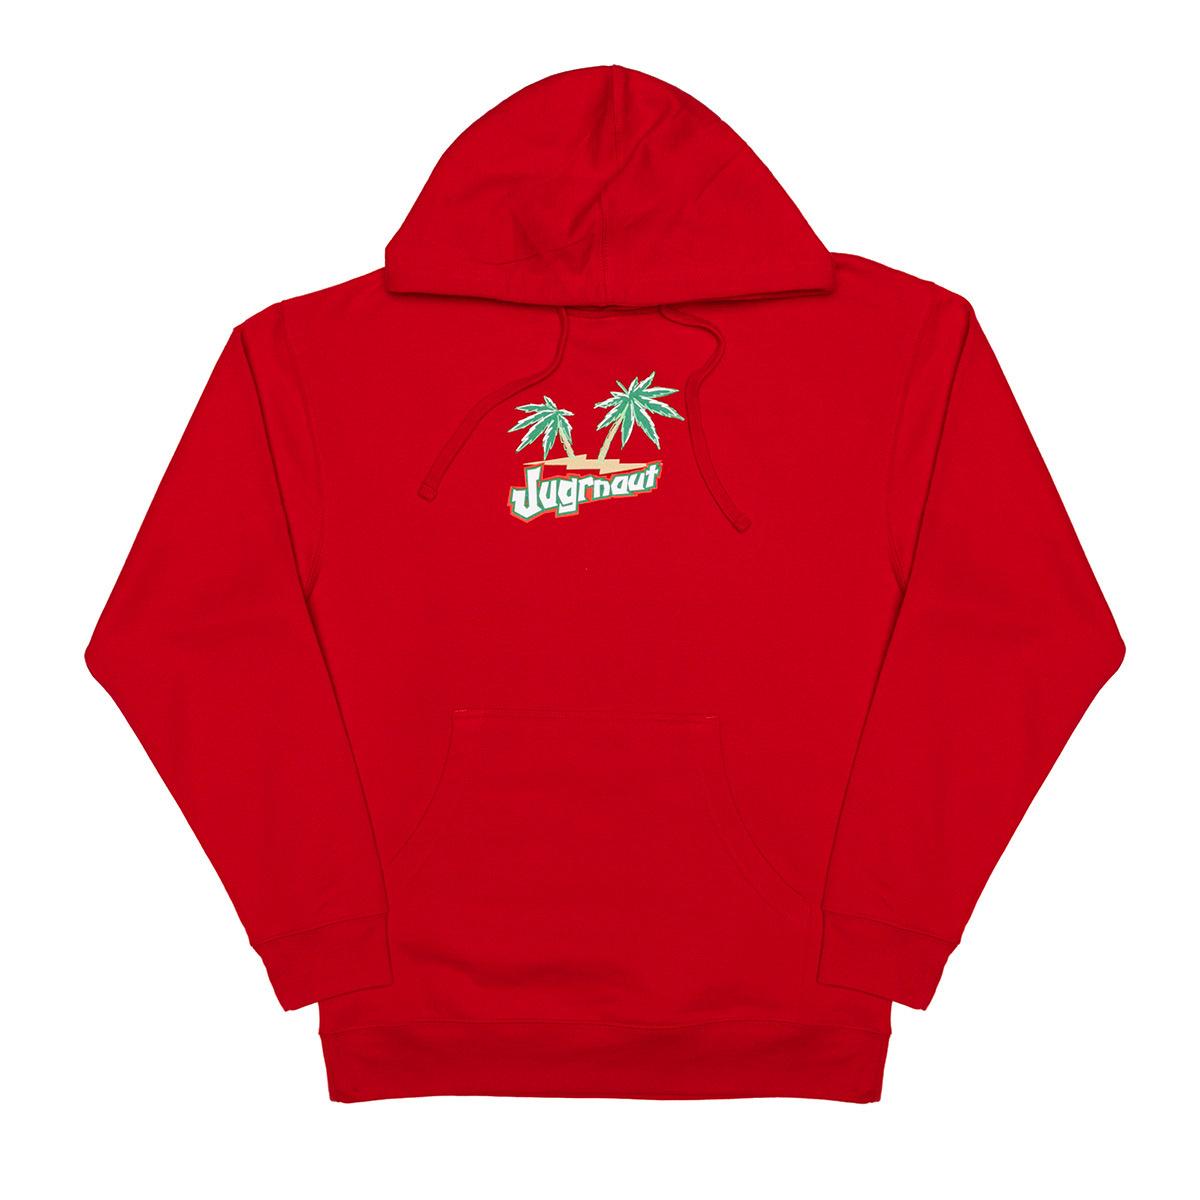 Jugrnaut Jugrnaut Tahitian Red Hoodie